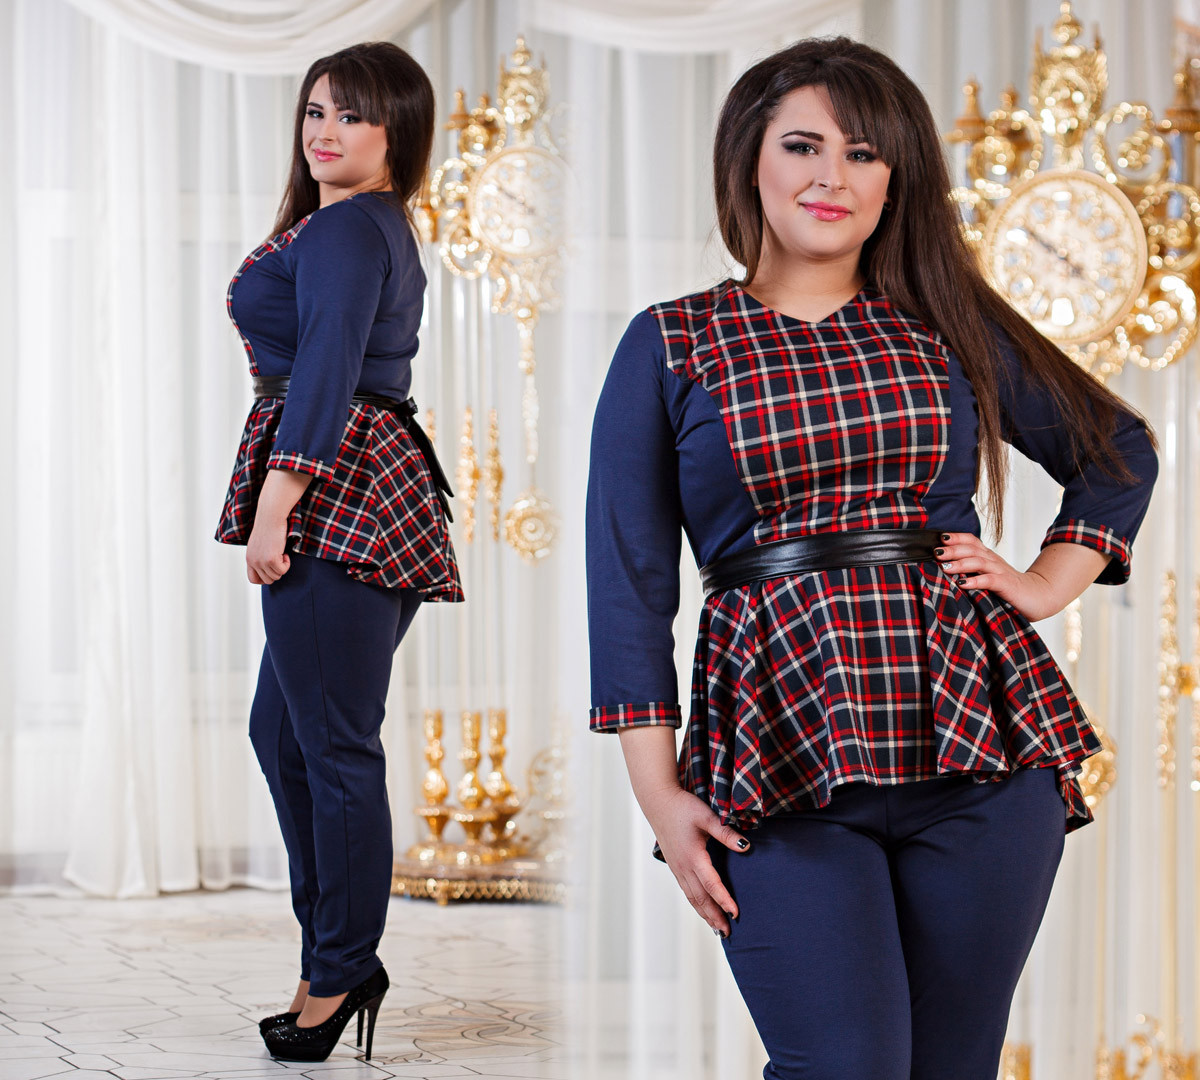 Д1040 10 Женский костюм баска + брюки размеры 50-56